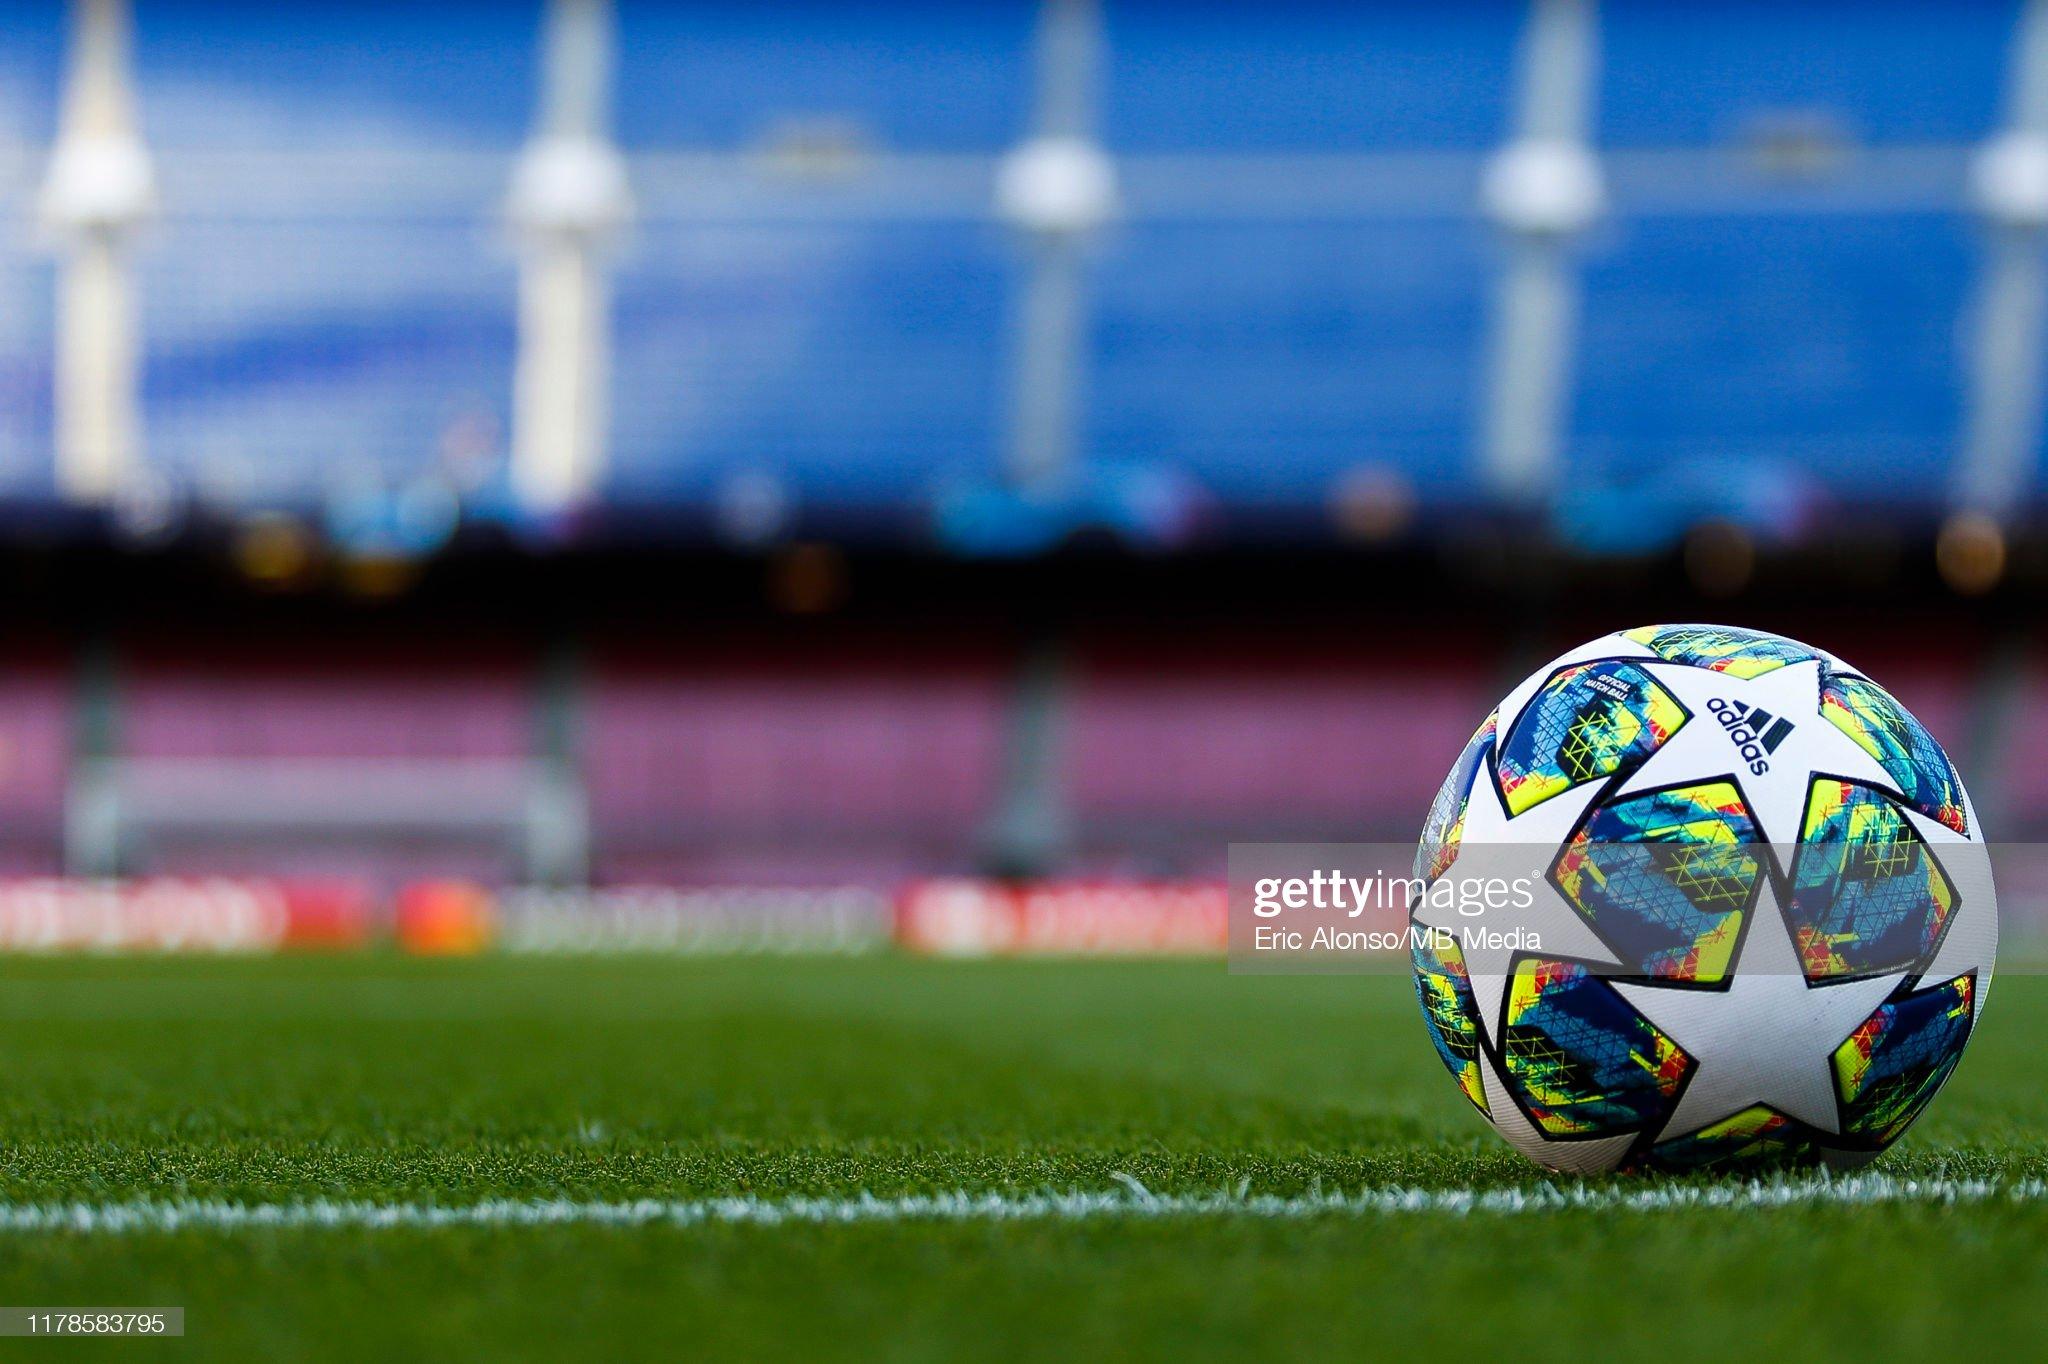 صور مباراة : برشلونة - إنتر 2-1 ( 02-10-2019 )  The-adidas-finale-19-on-the-pitch-before-the-uefa-champions-league-f-picture-id1178583795?s=2048x2048